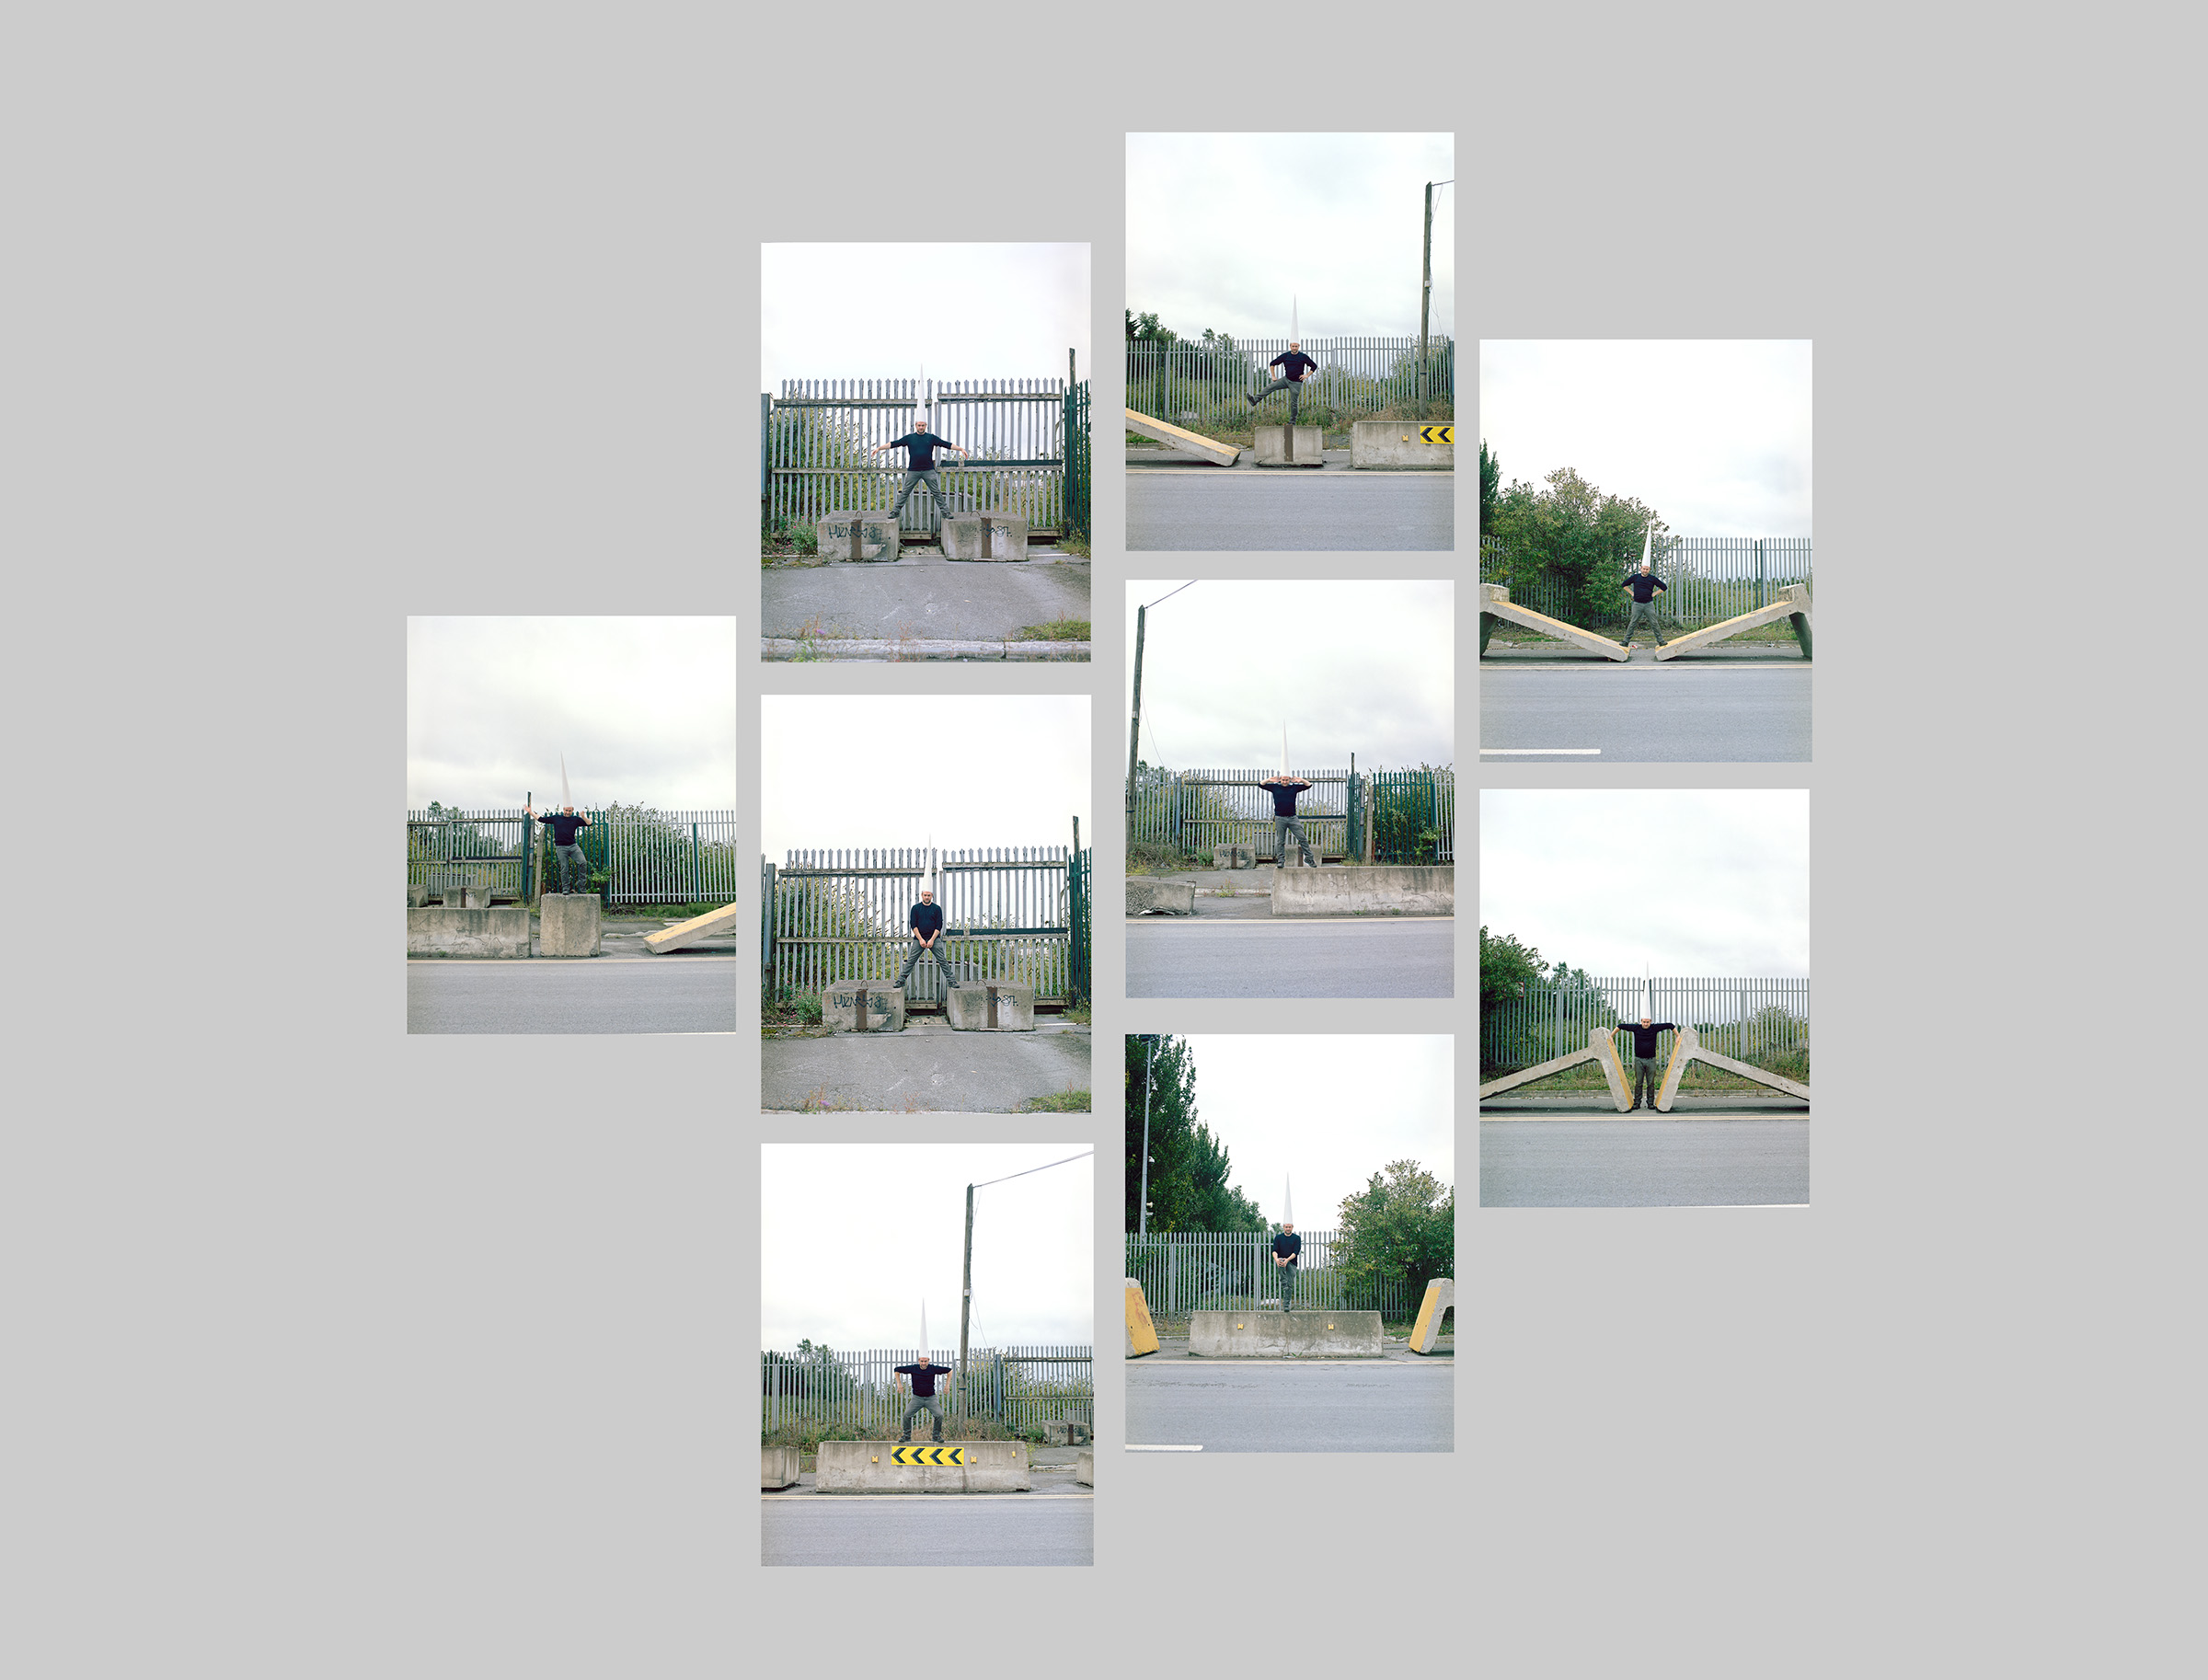 9dumbposes_Docks_2